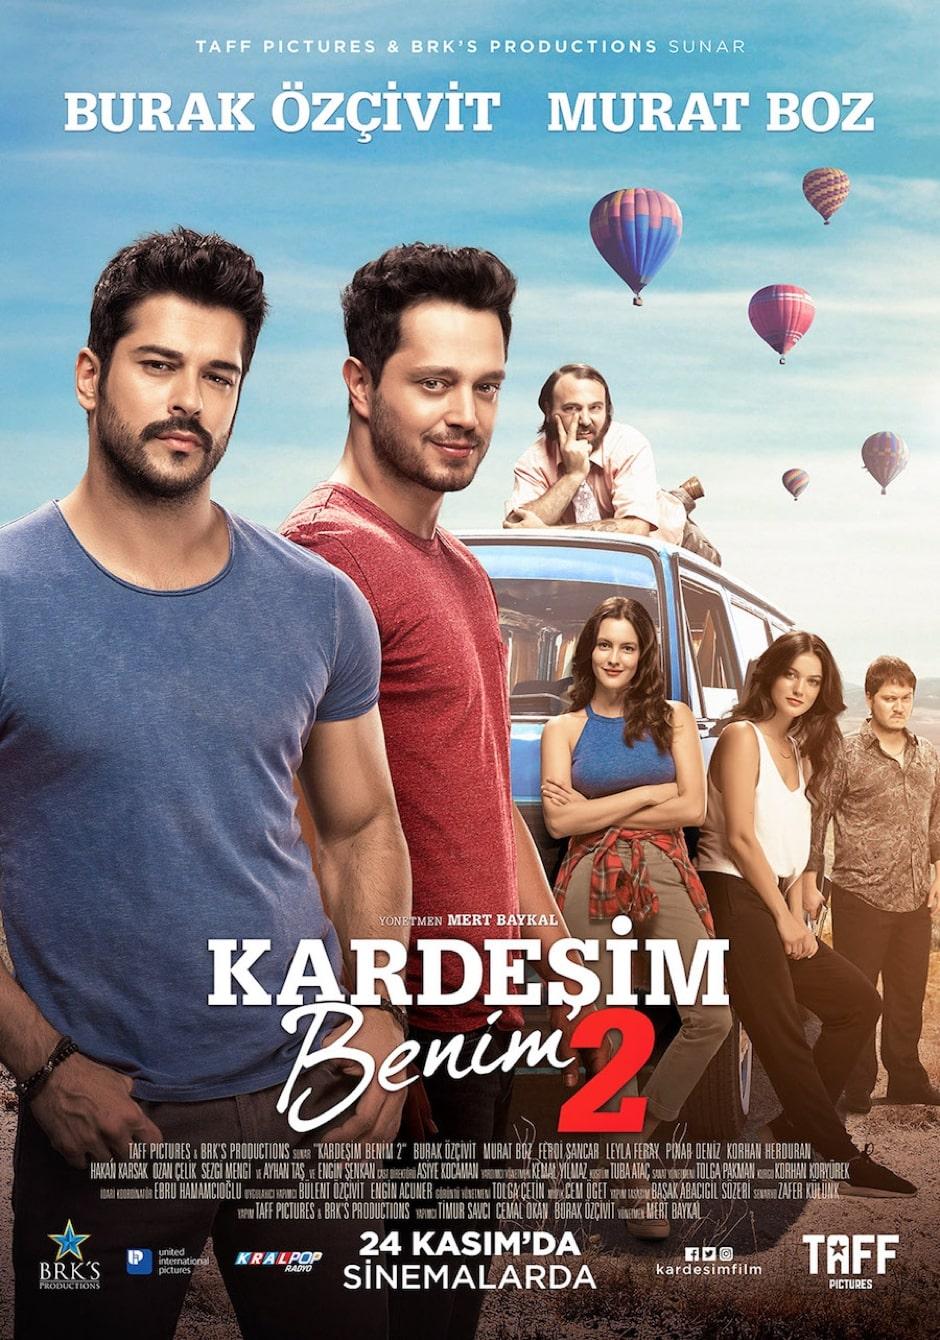 Kardesim_Benim_Poster Copy 2-min